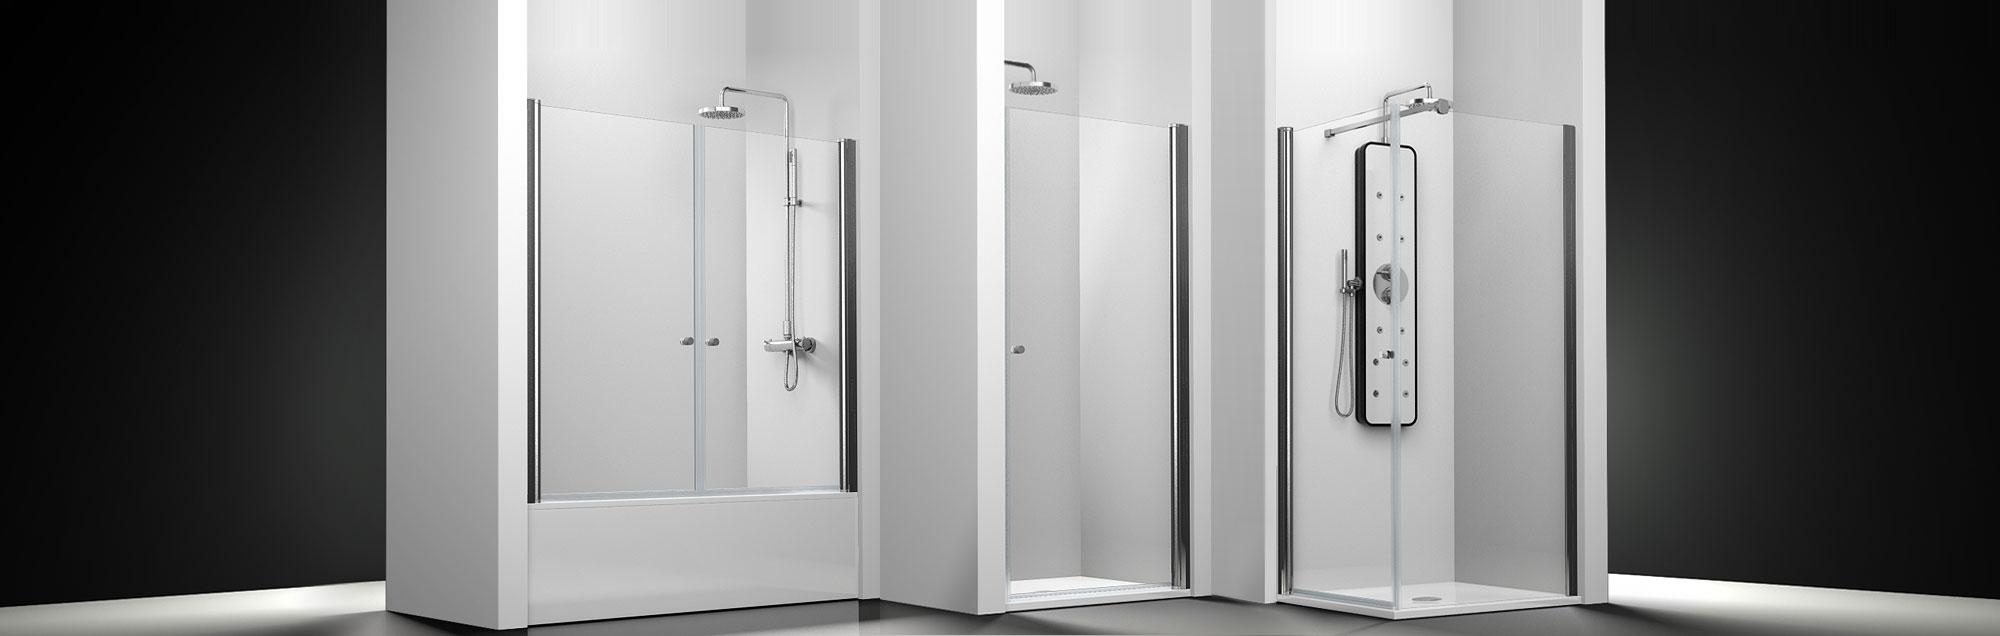 Serie Arcoíris de mamparas abatibles de ducha a medida